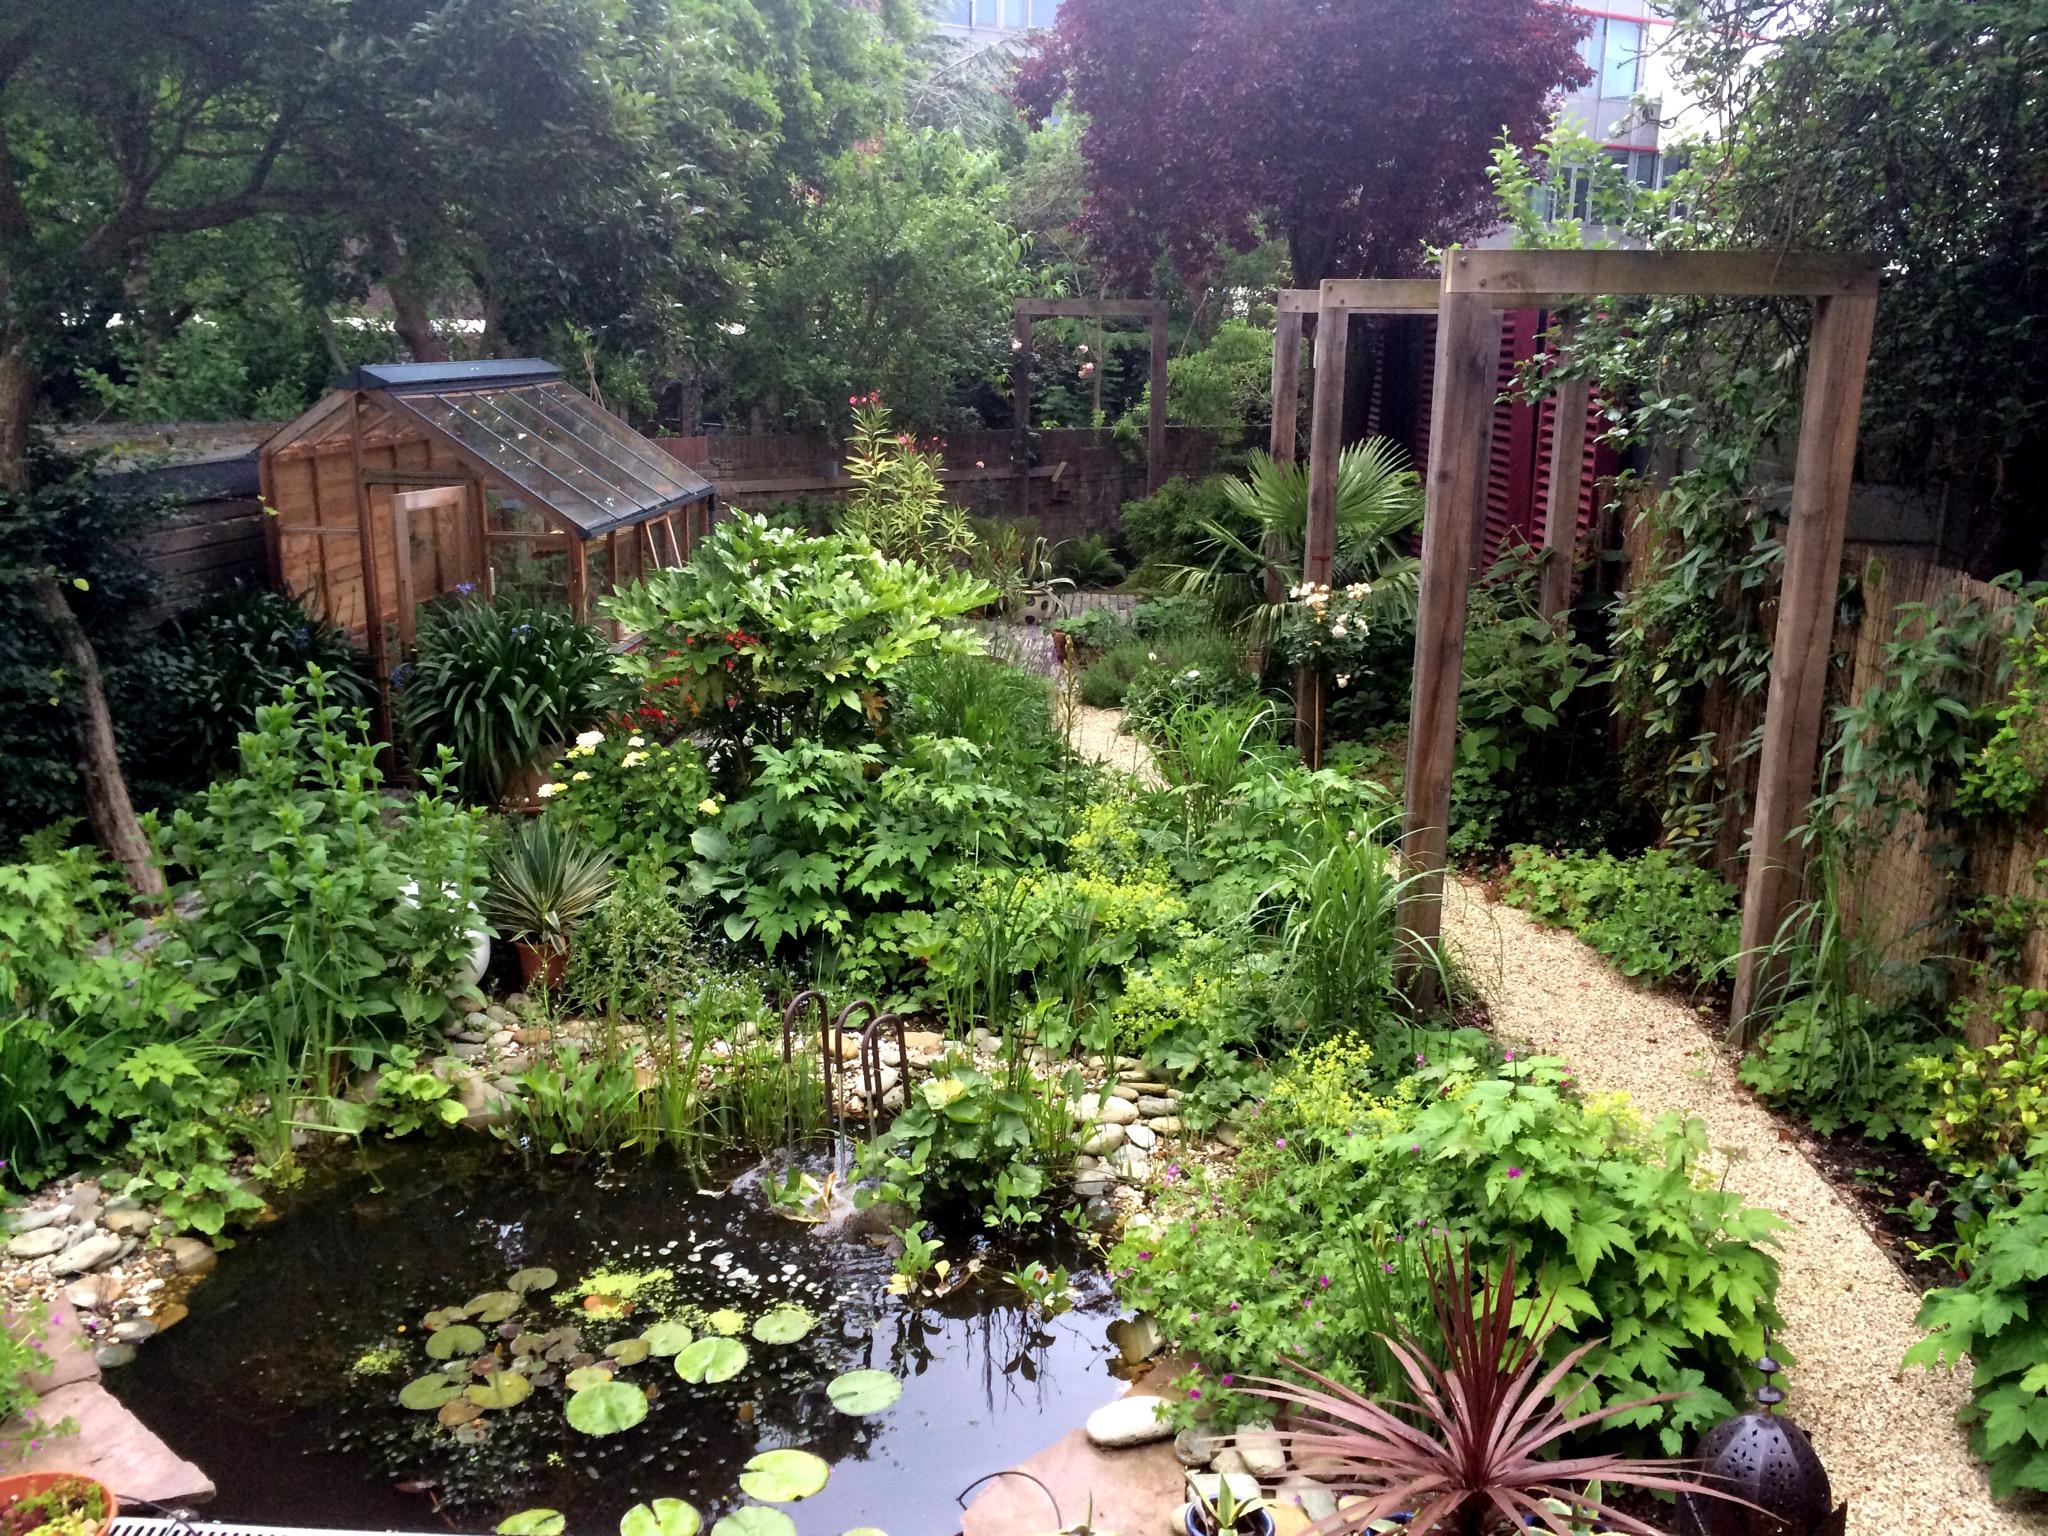 Alison S Gardens Mediterranean Garden: Look : A Dutch Mediterranean Garden